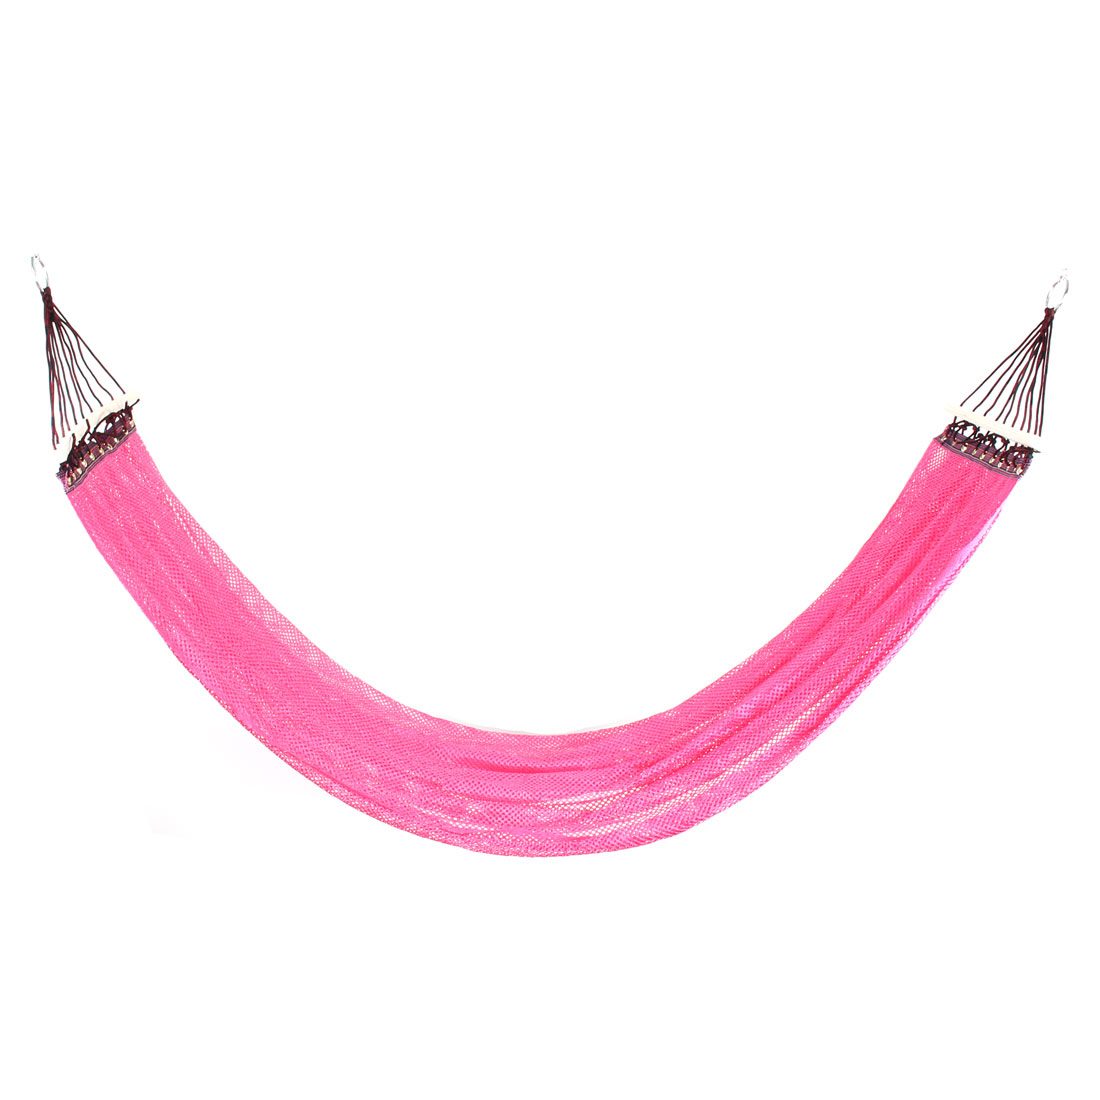 Camping Hiking Nylon Mesh Spreader Swing Hanging Bed Suspended Hammock Pink